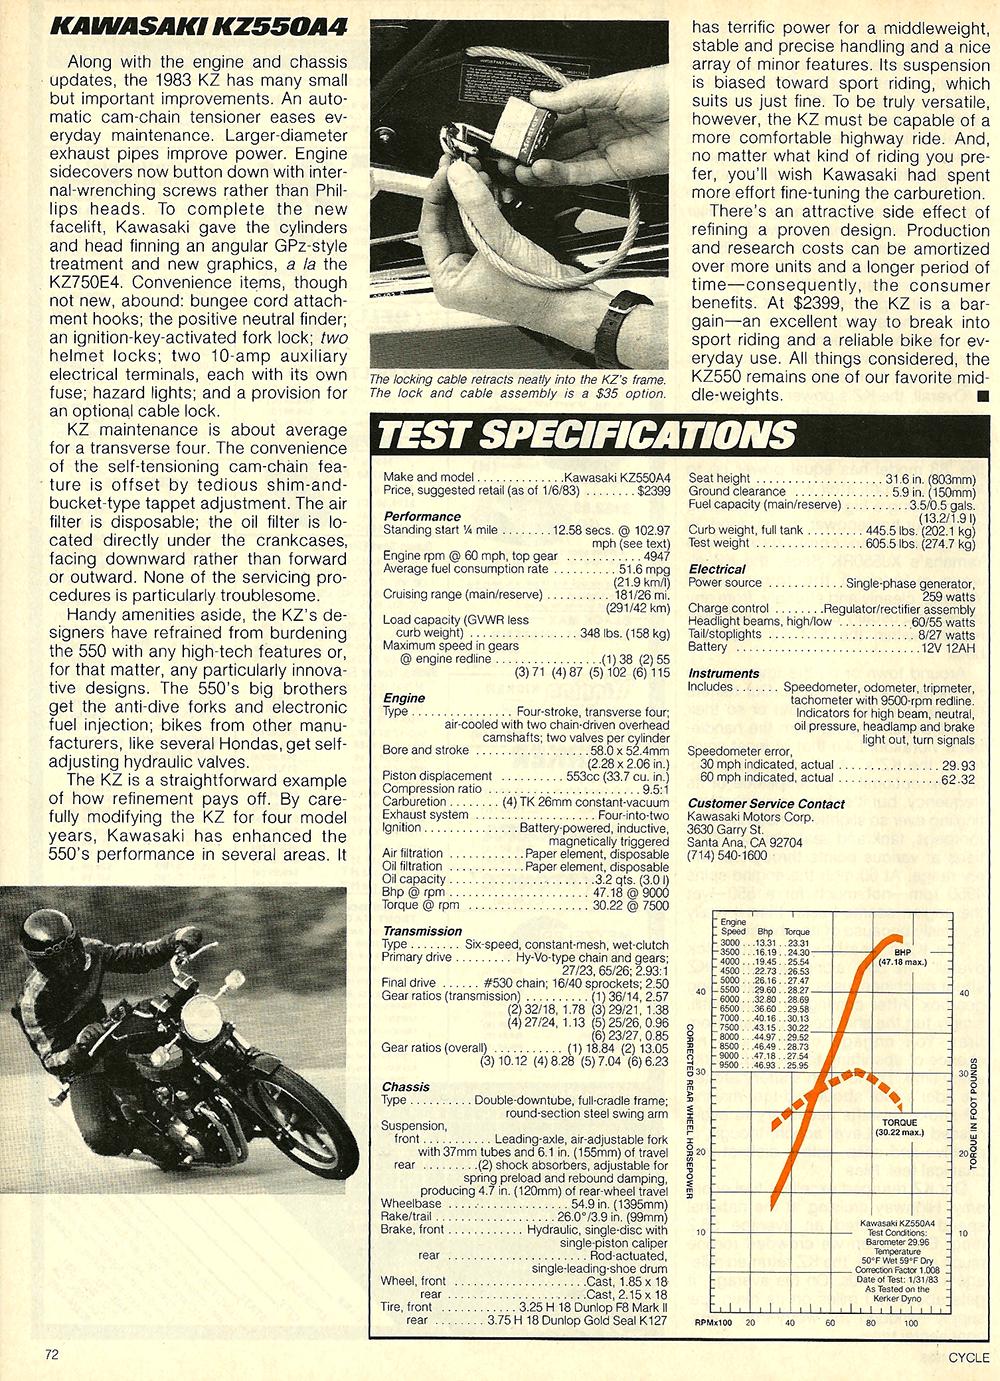 1983 Kawasaki KZ550 A4 road test 8.jpg